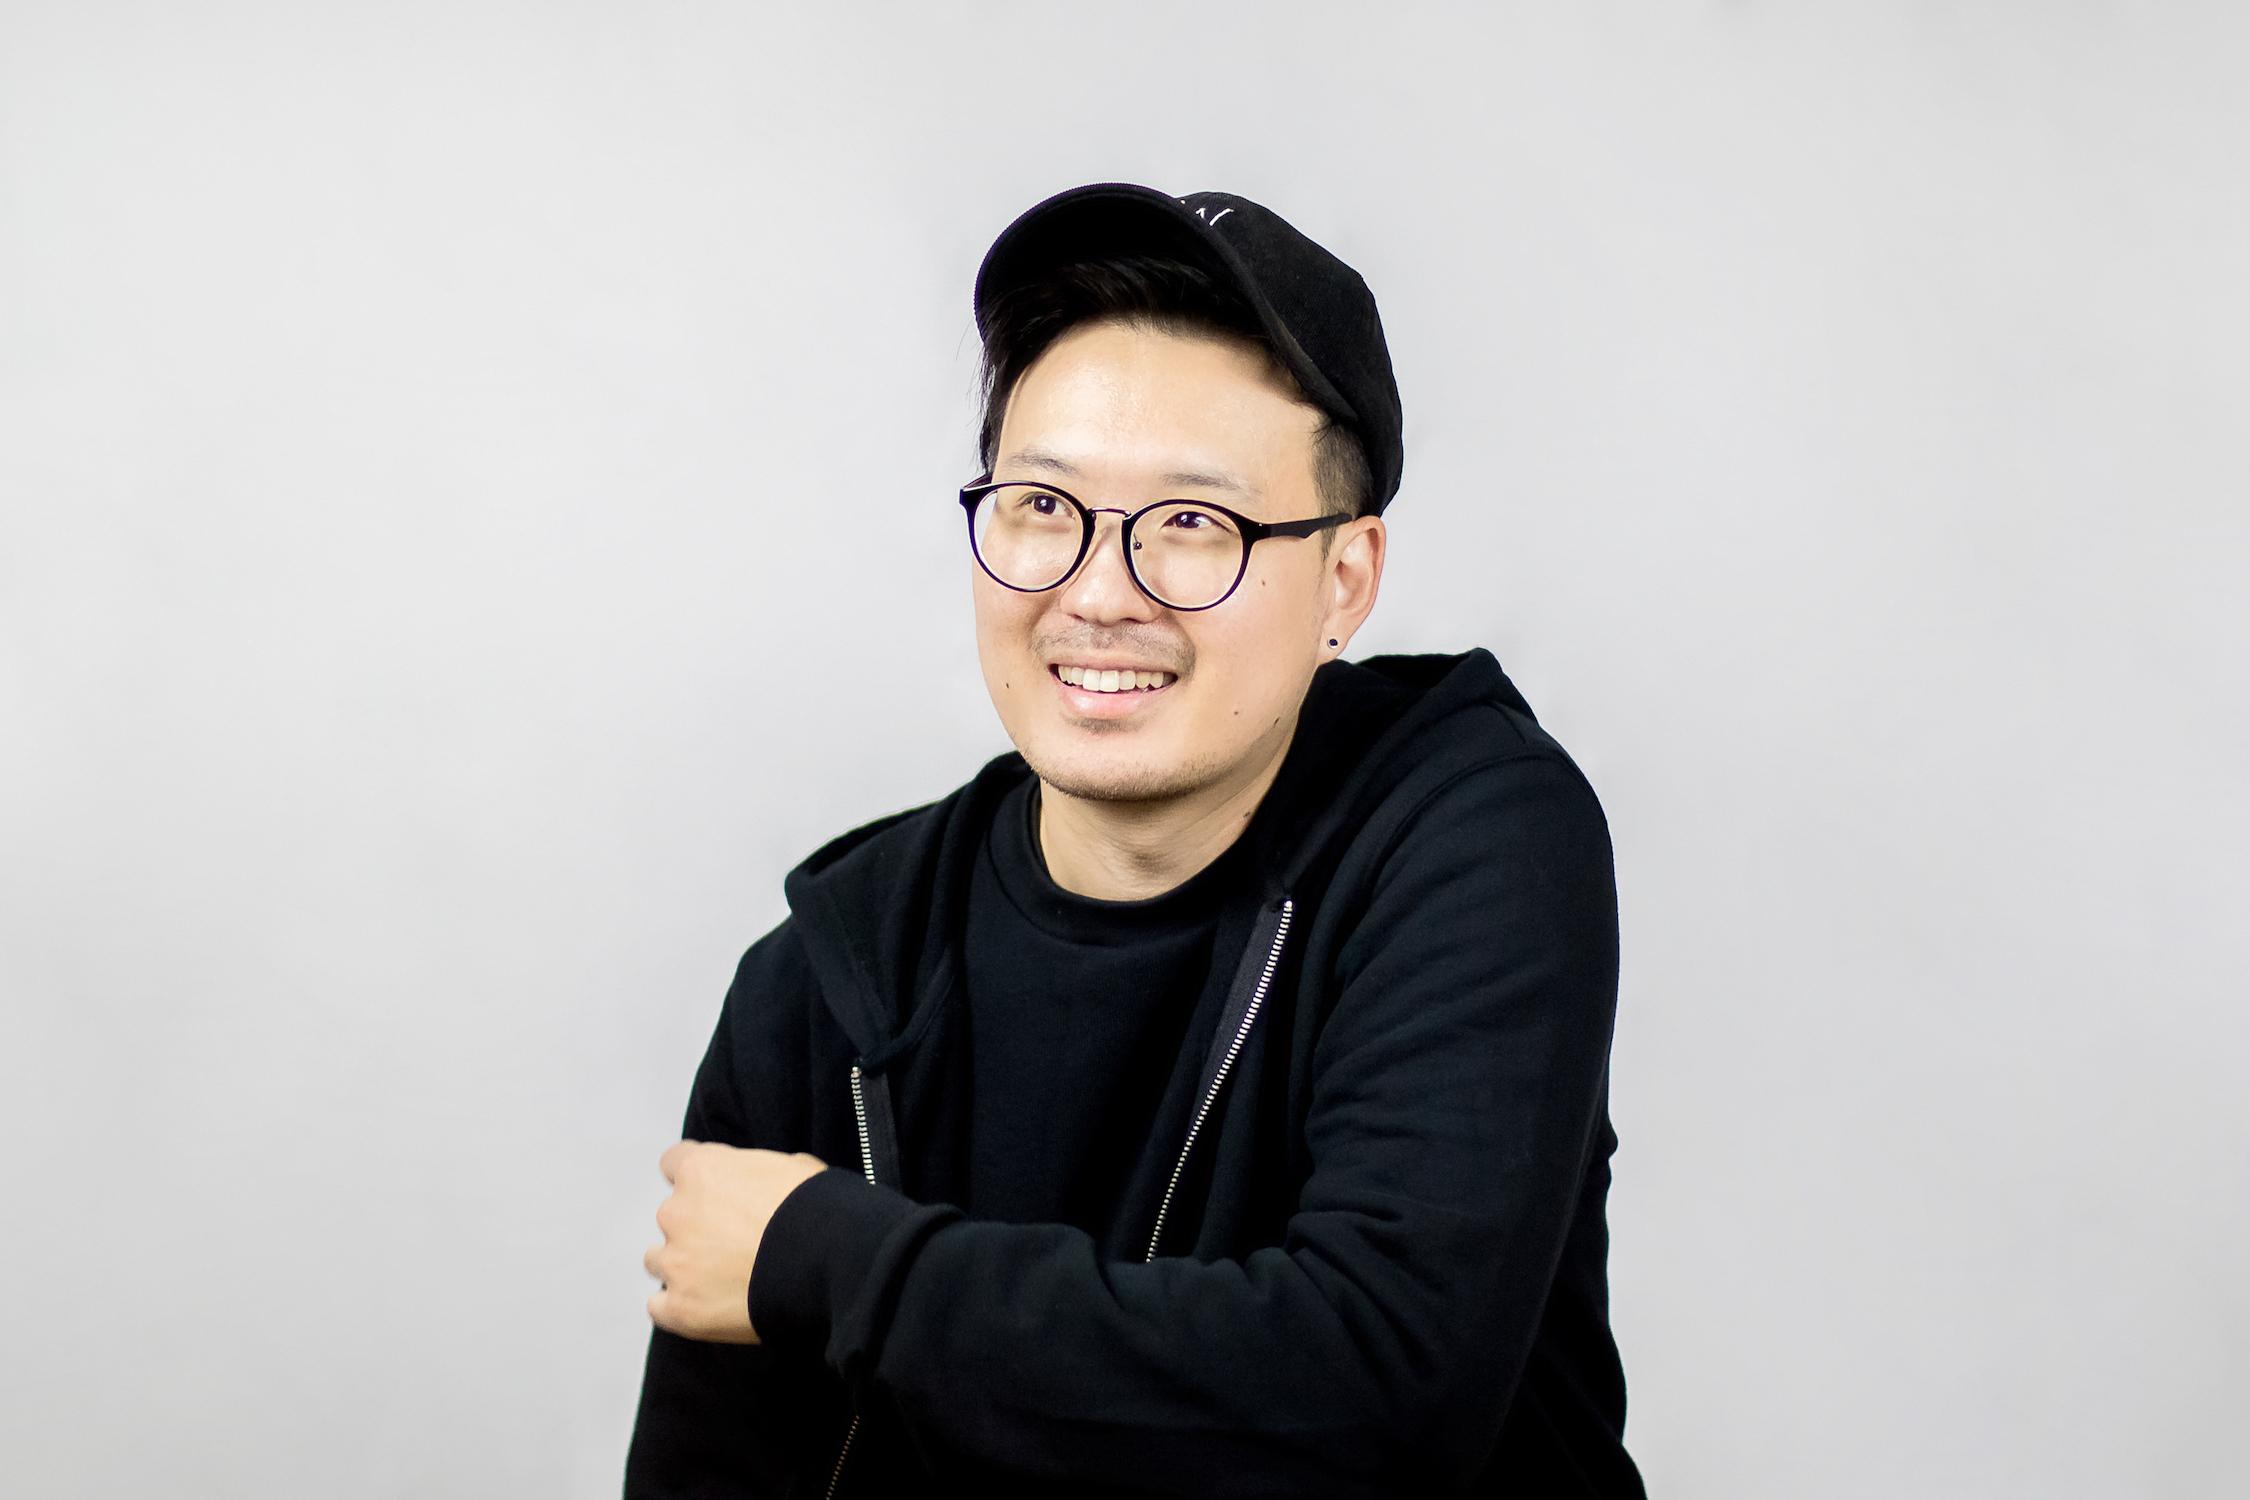 Won Jang Photoshoot - SMALLER.jpeg